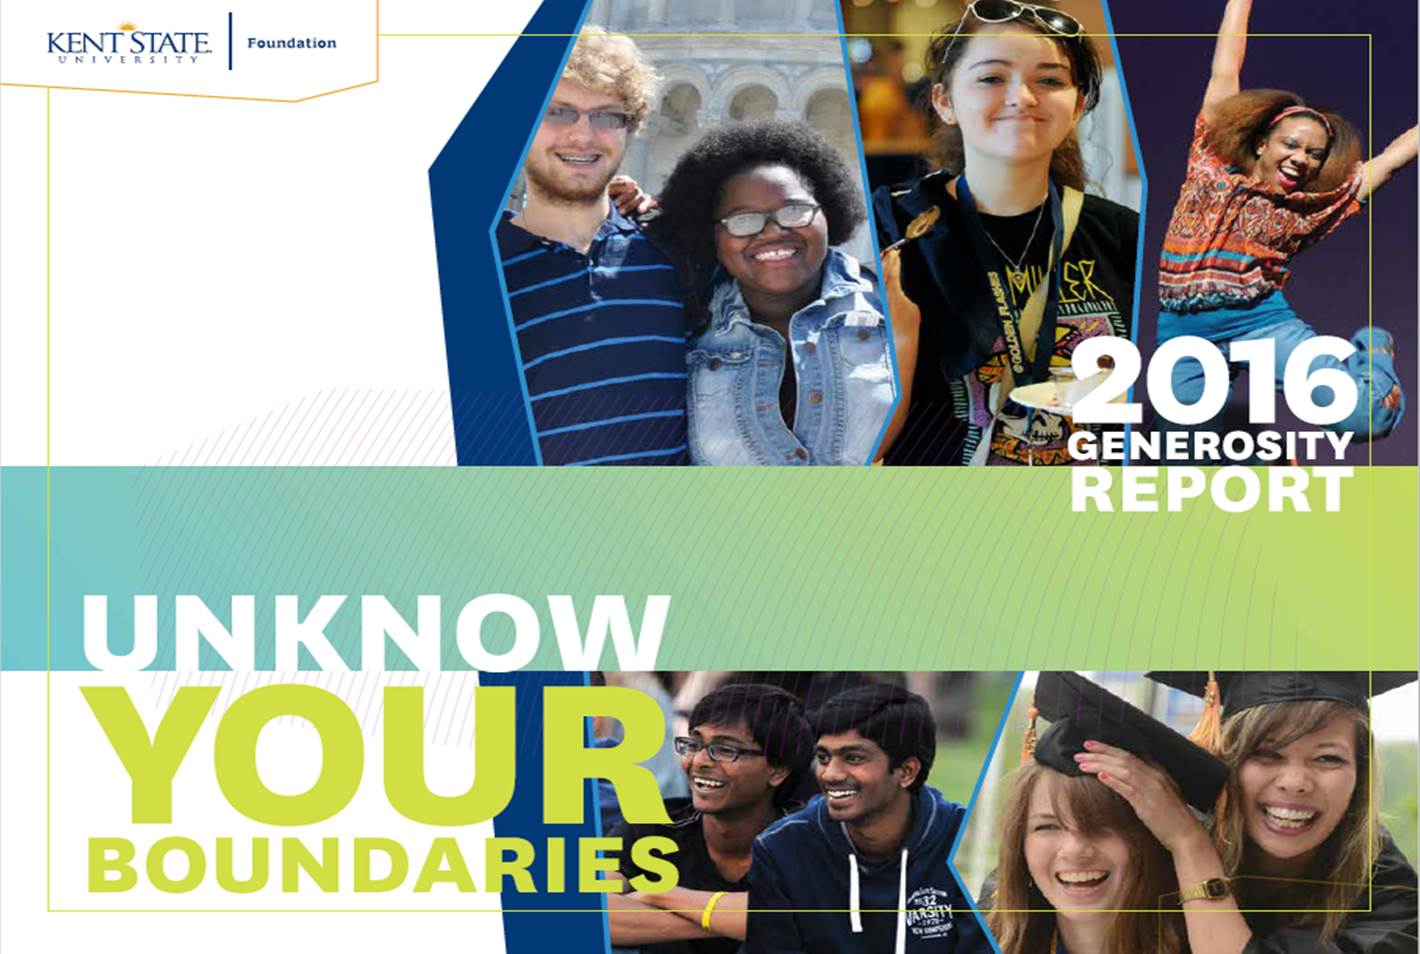 2016 Generosity Report Cover